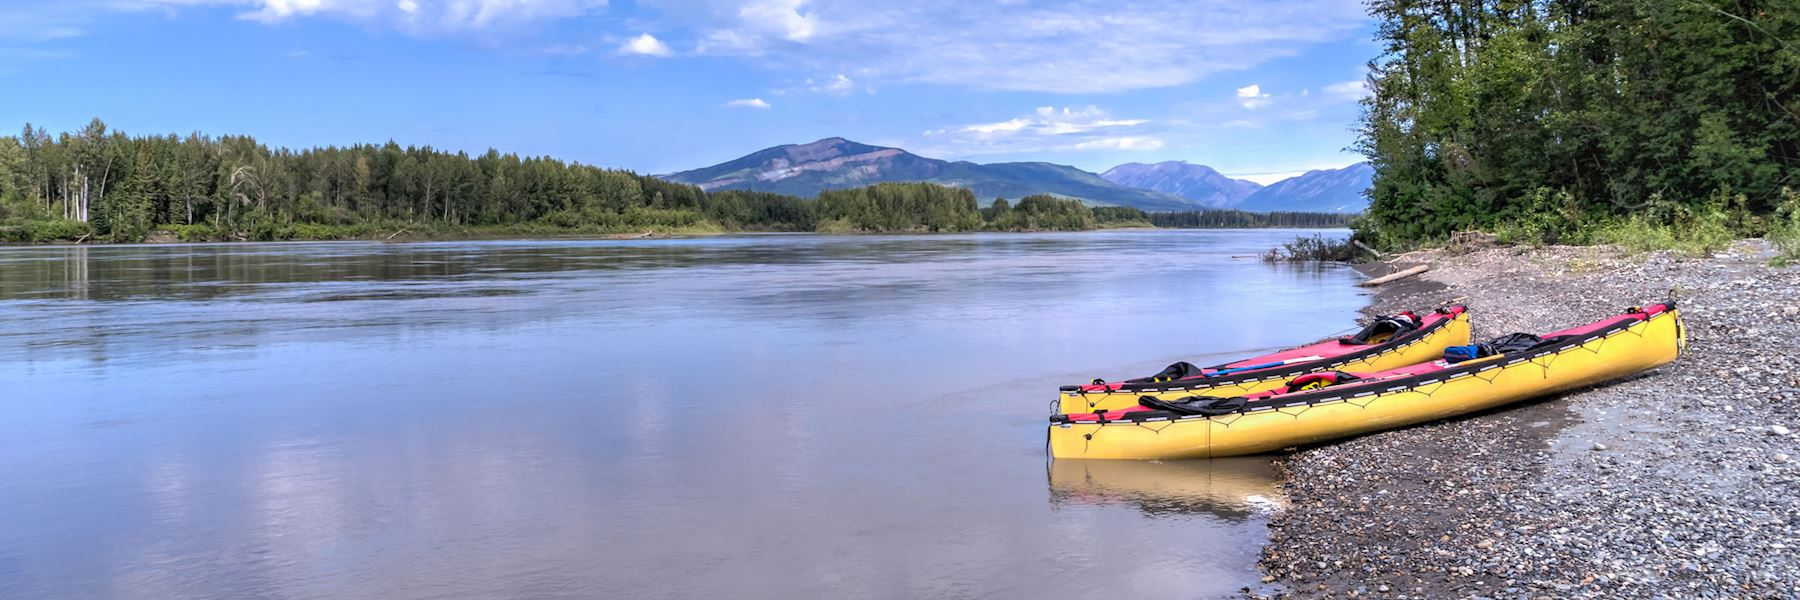 Visit Nahanni National Park, Canada